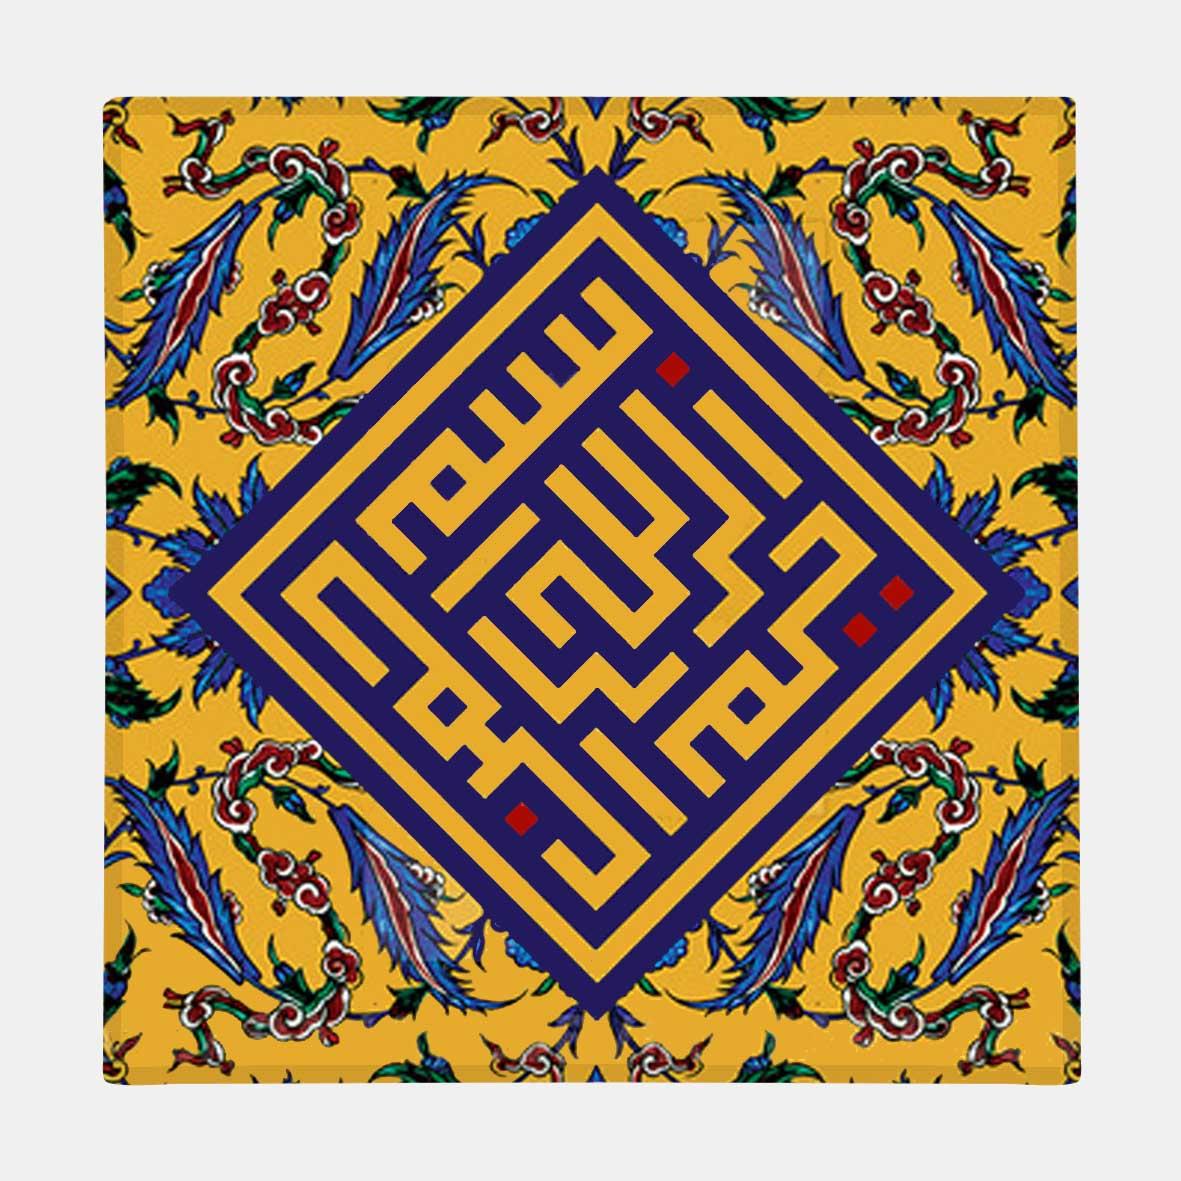 خرید                      کاشی طرح مذهبی بسم الله کد kash033